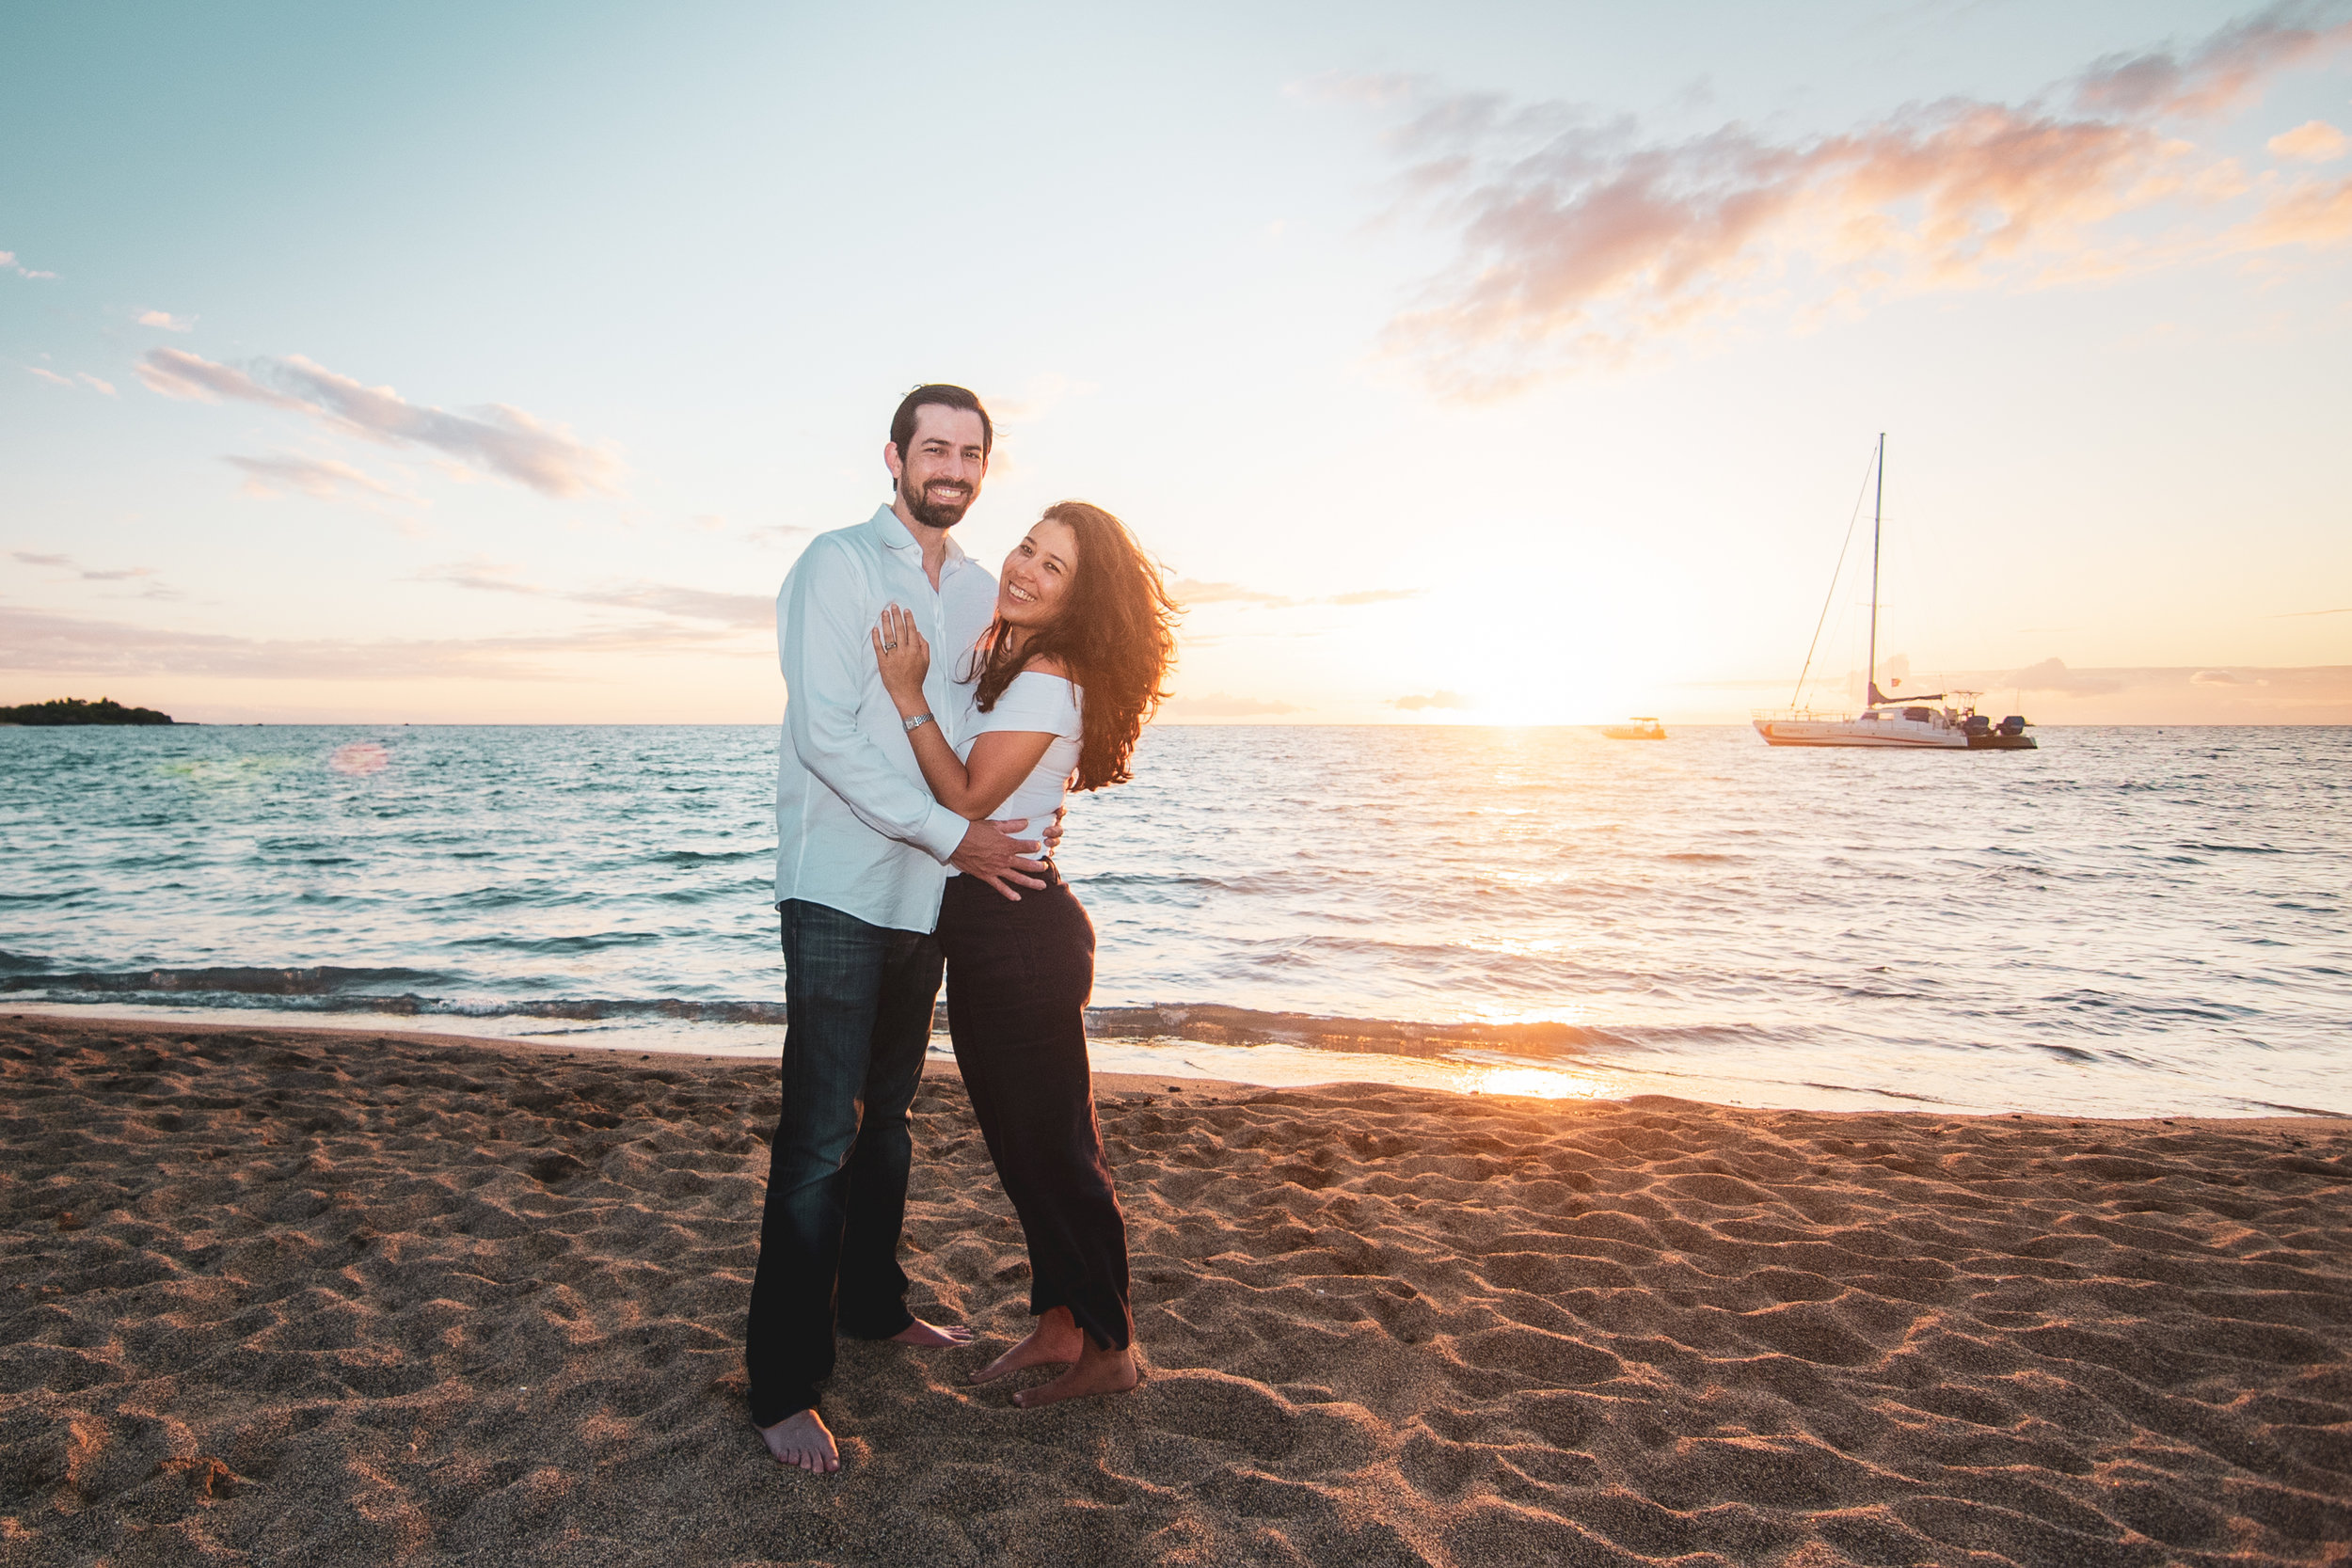 big island hawaii kona lifestyle beach family © kelilina photography 20190609185920.jpg